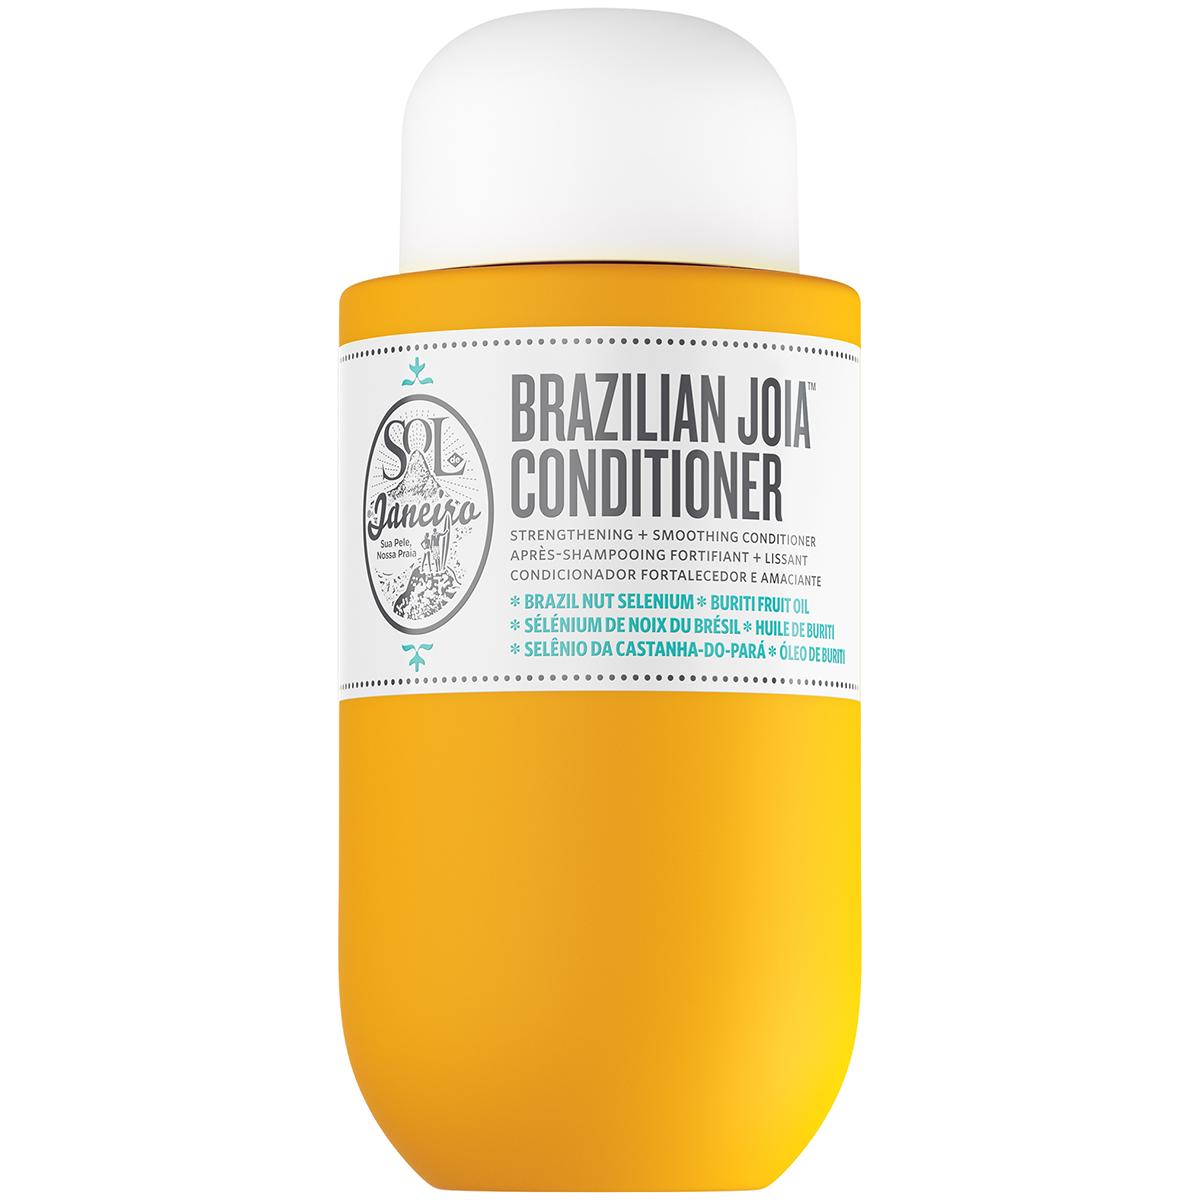 Sol de Janeiro - Brazilian Joia Strengthening + Smoothing Conditioner 295 ml